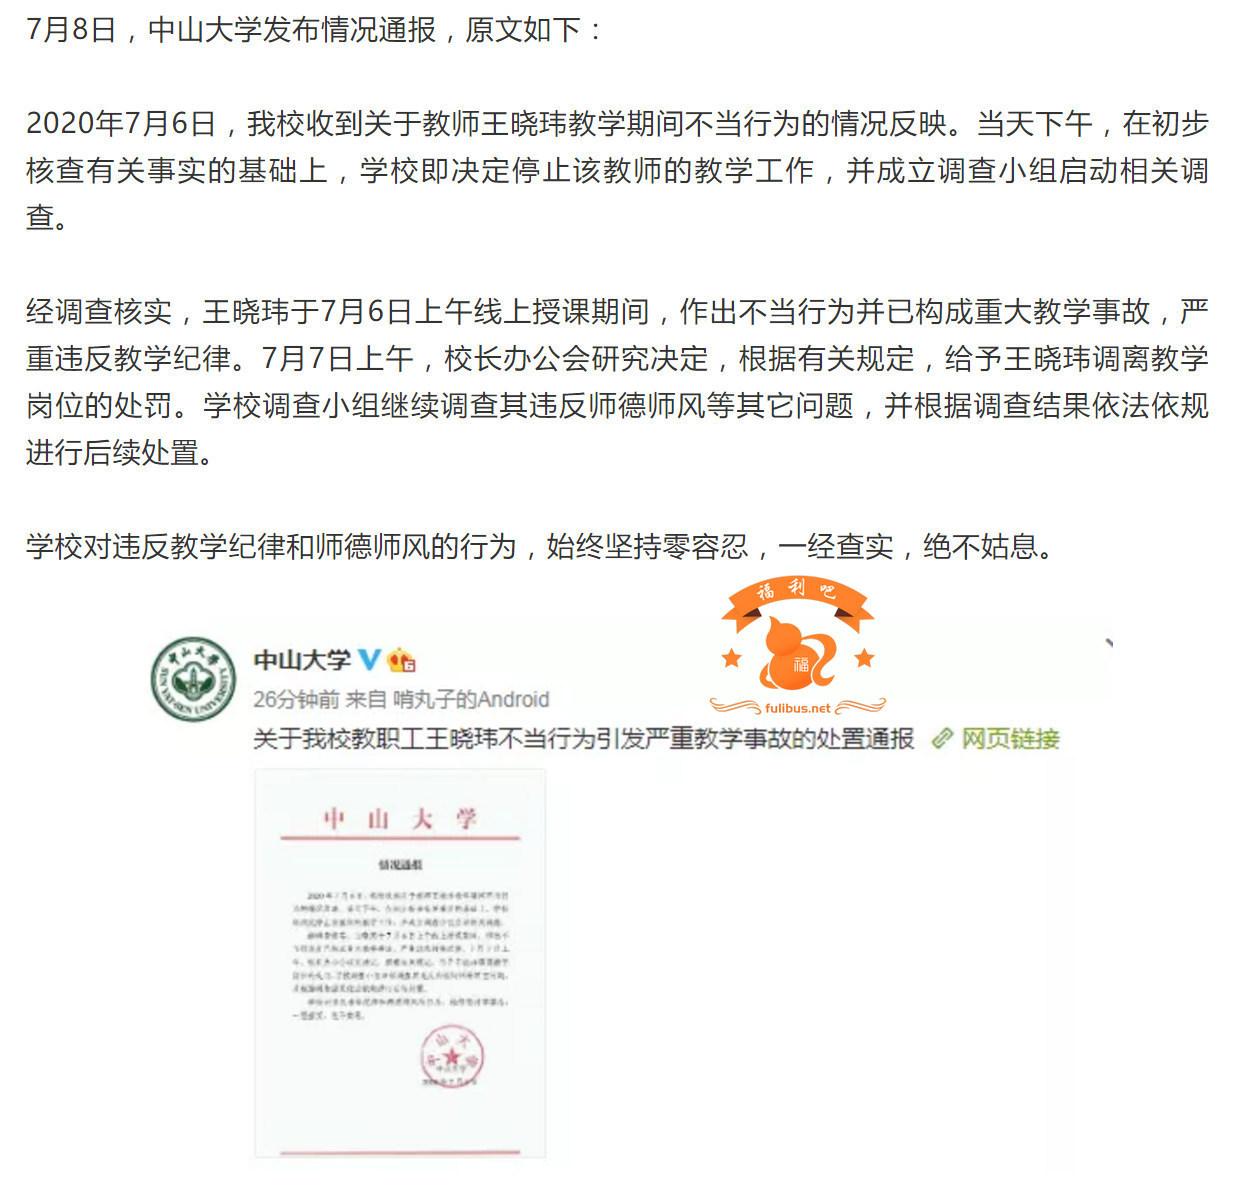 fulibus.net福利吧2020-07-09_01